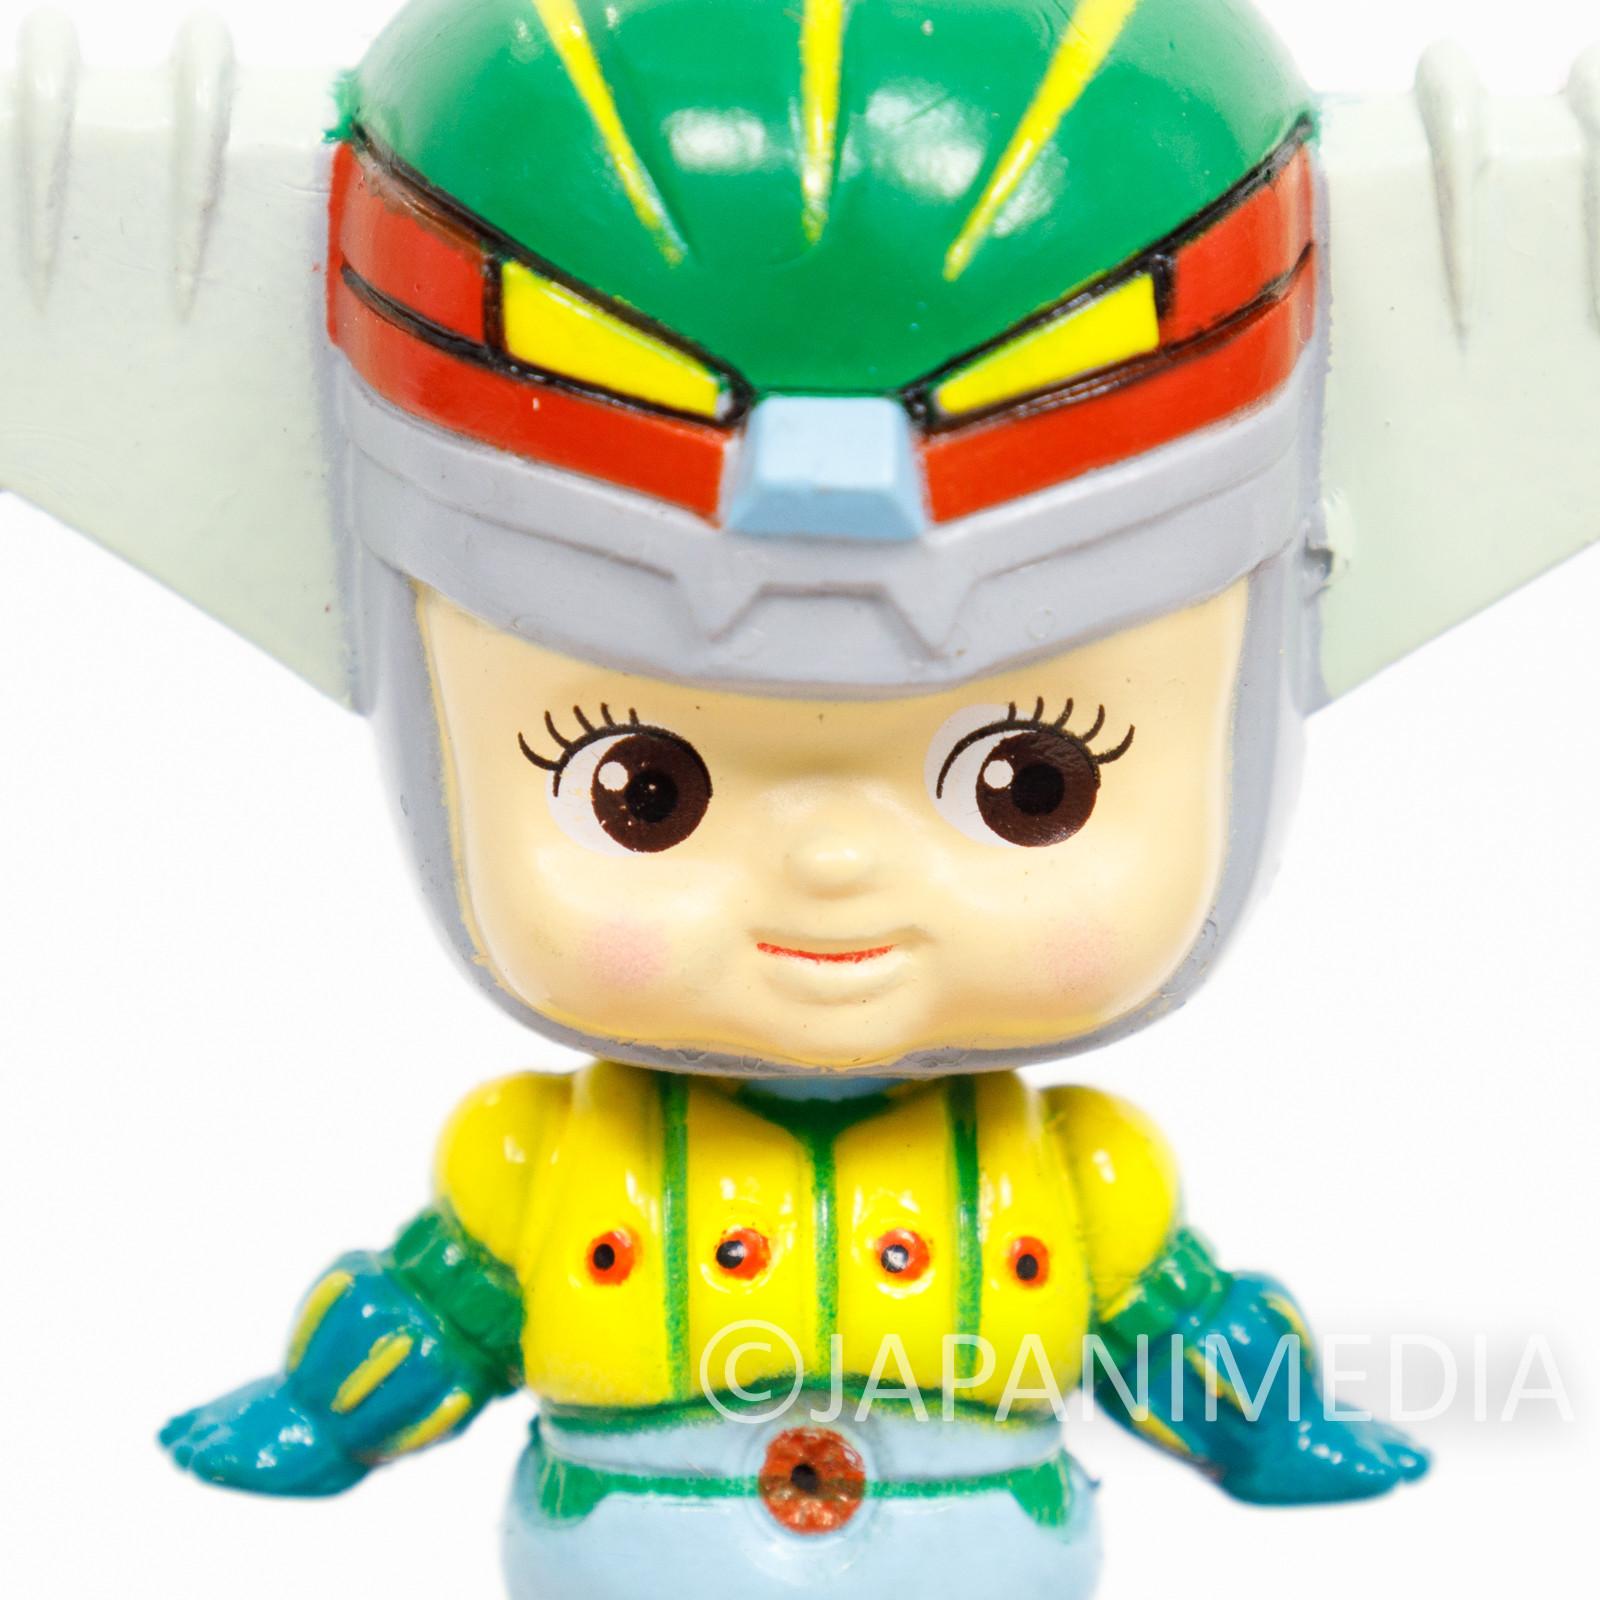 Koutetsu Steal Jeeg mall Bobbin Head Figure Toyfull JAPAN ANIME